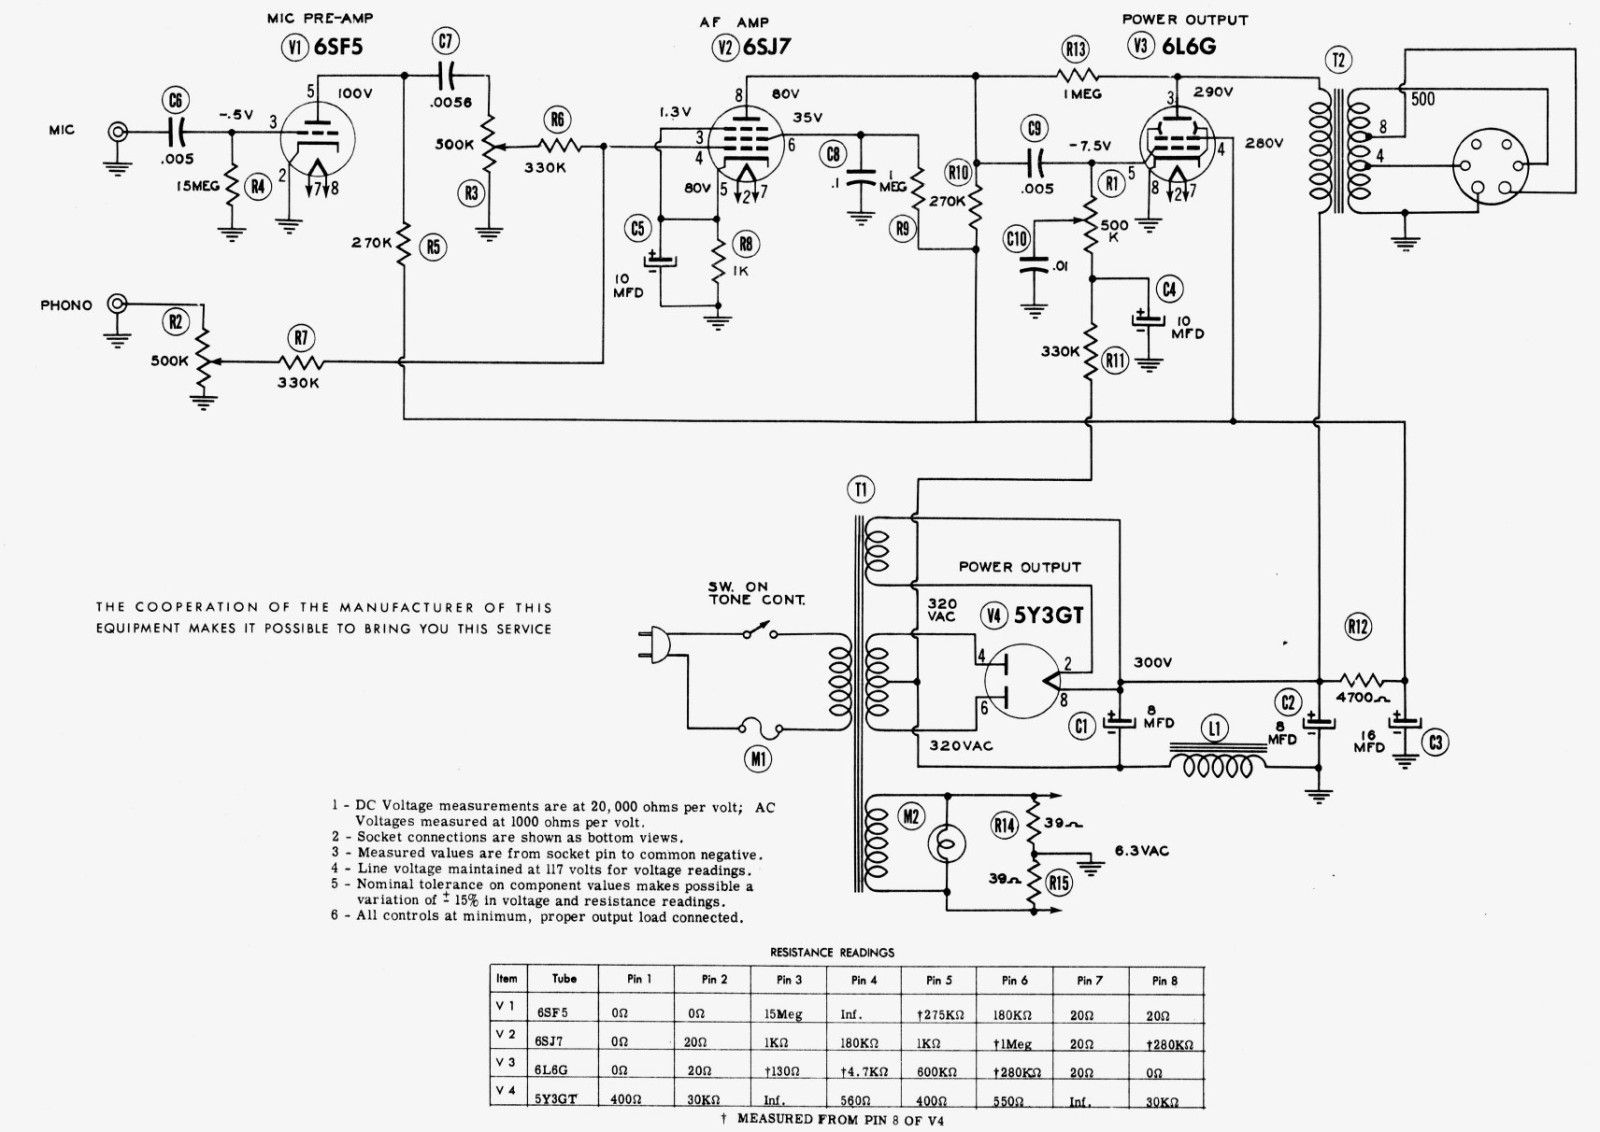 amplifier wiring kit radio shack 2005 dodge stratus diagram schematic rca pa schematics elsavadorla